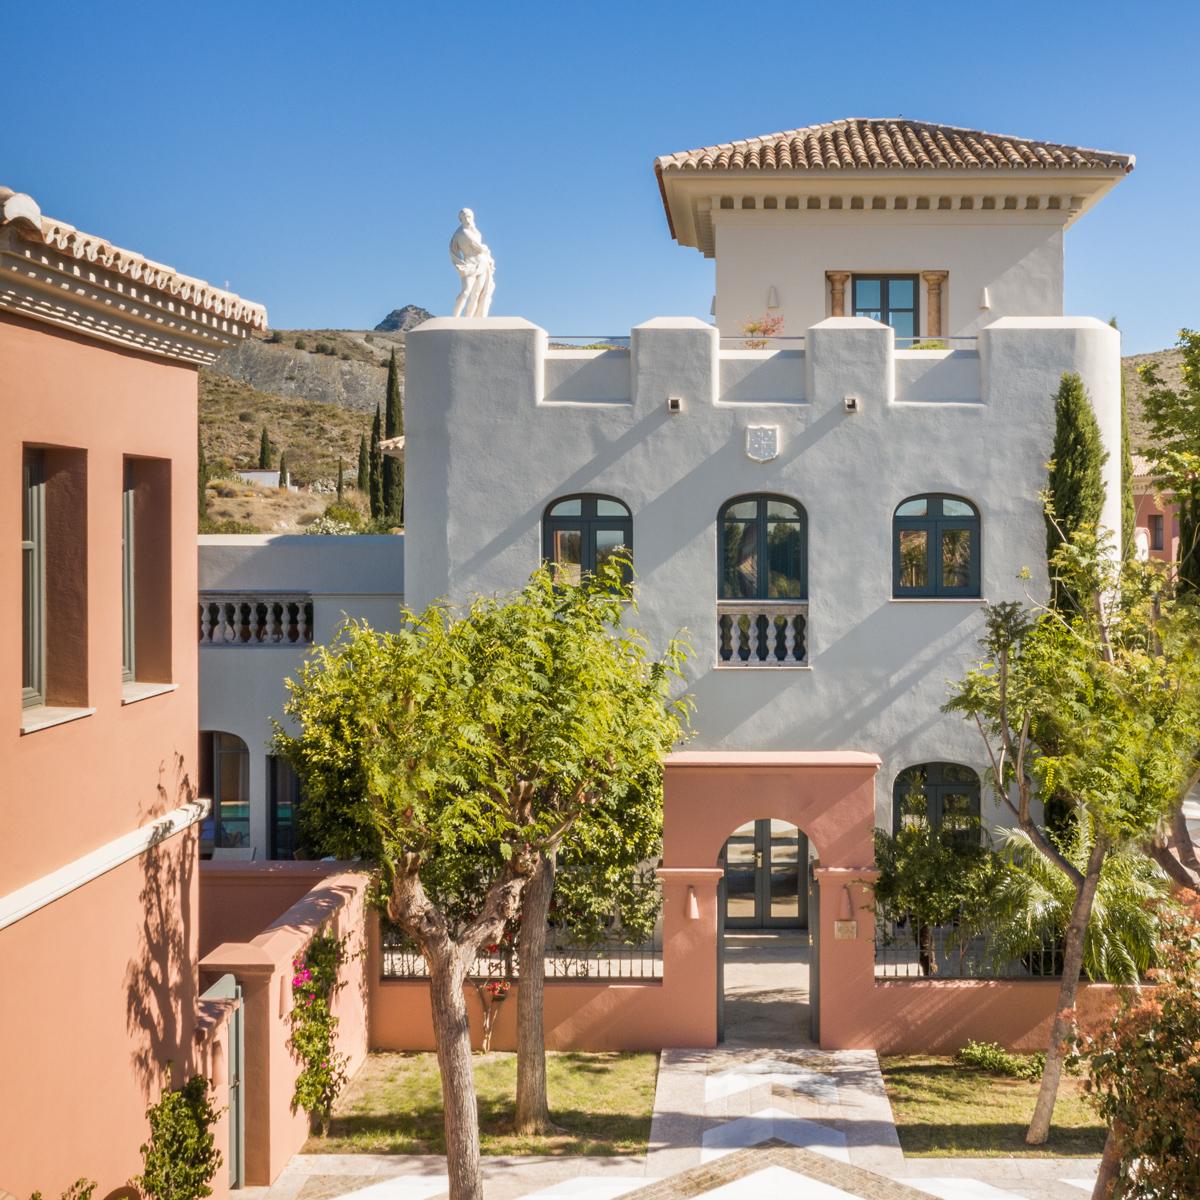 Anantara Luxus Hotel in Marbella-2